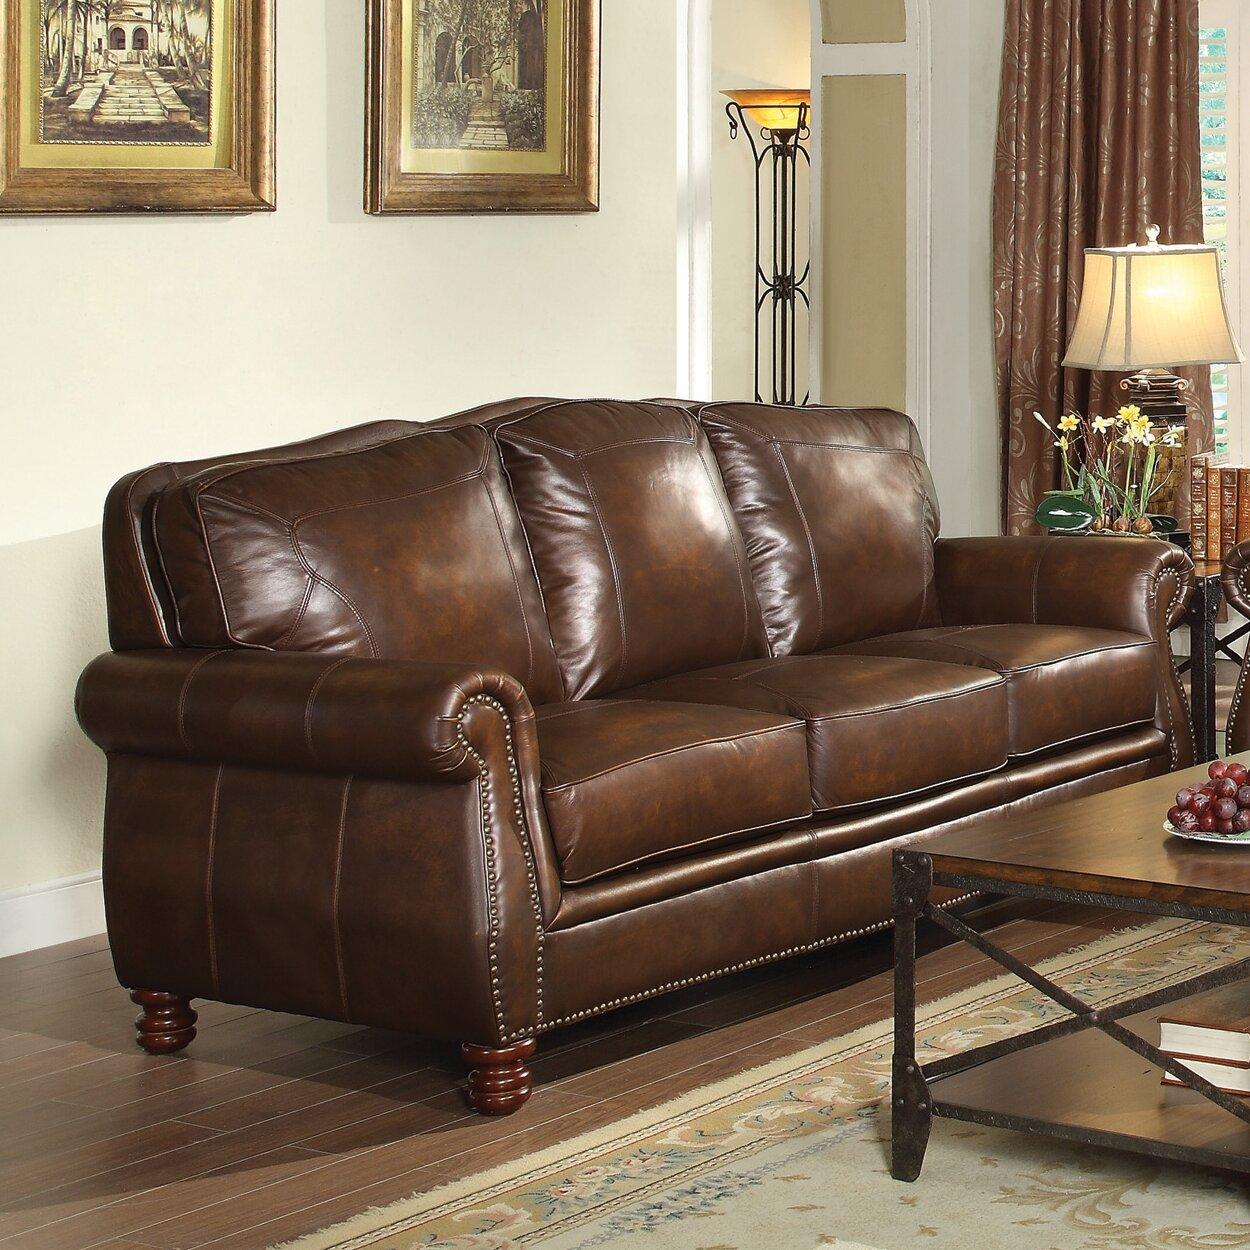 Rosalind wheeler walborn leather sofa reviews wayfair for Leather sectional sofa wayfair